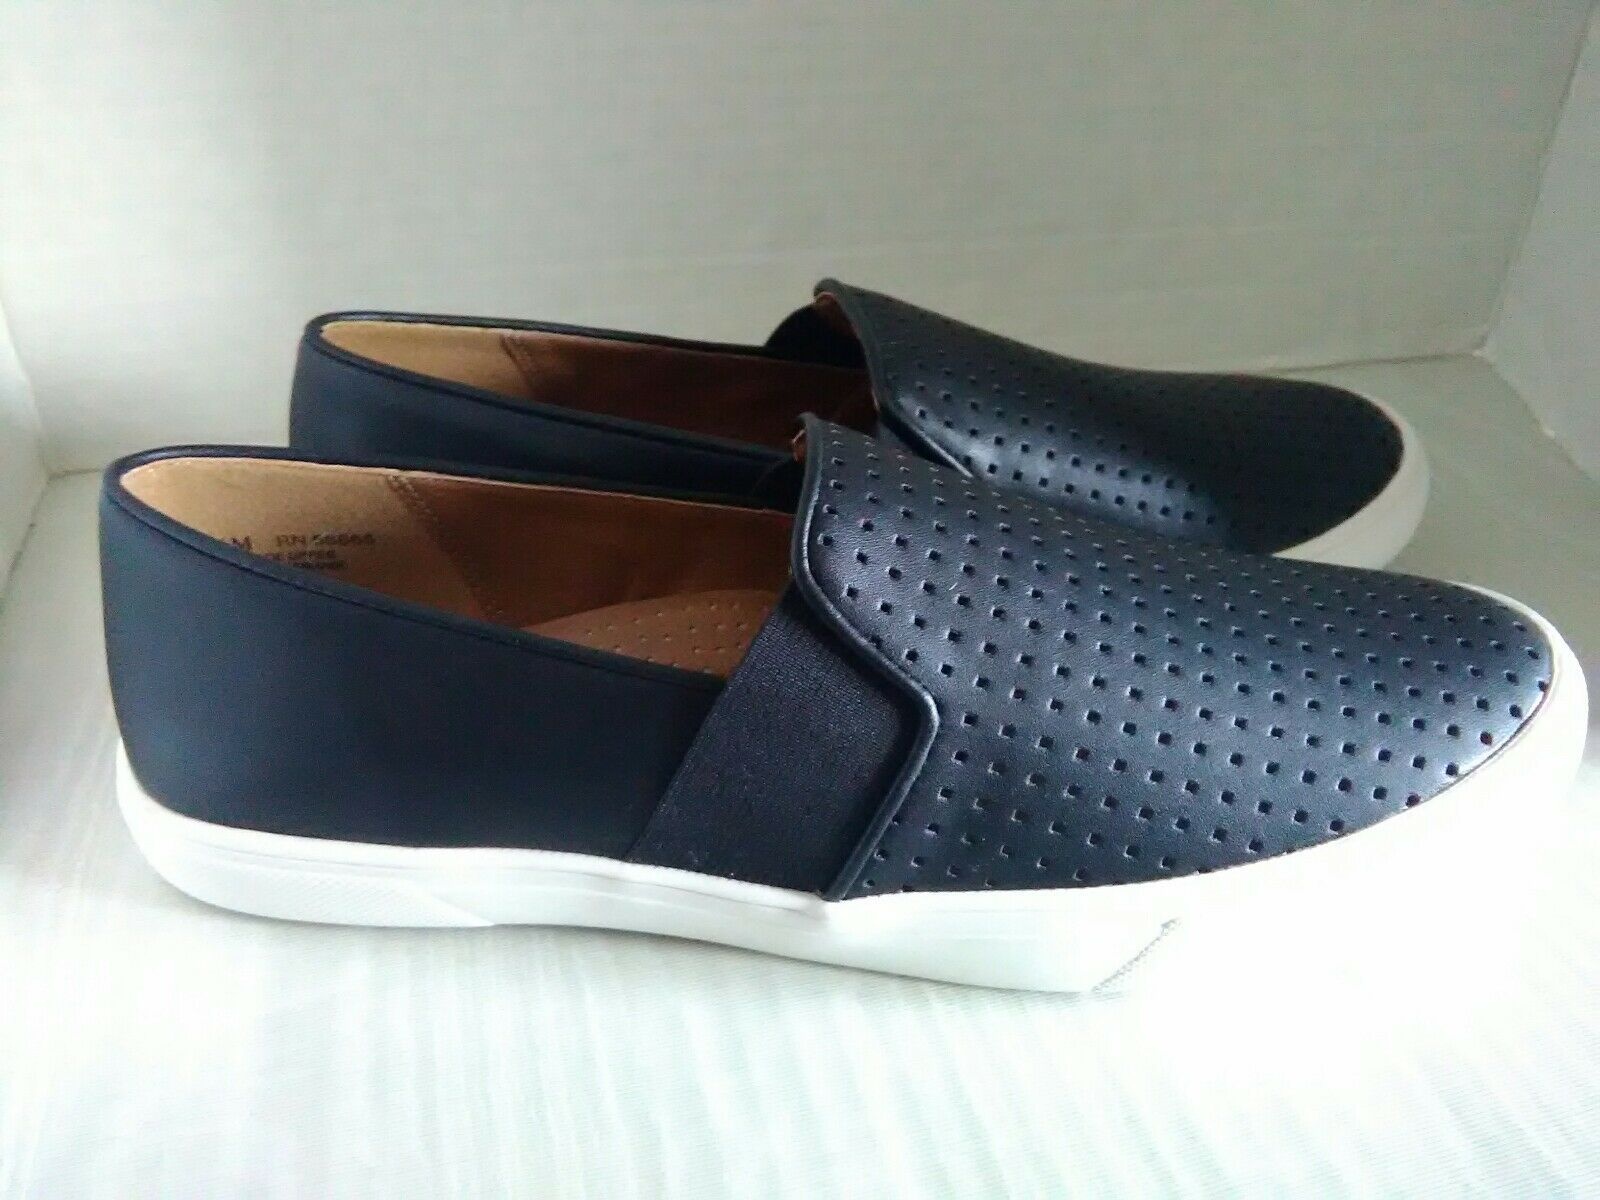 SUSINA Rizzo Slip-On Sneaker Women's Size 8.5M NIB